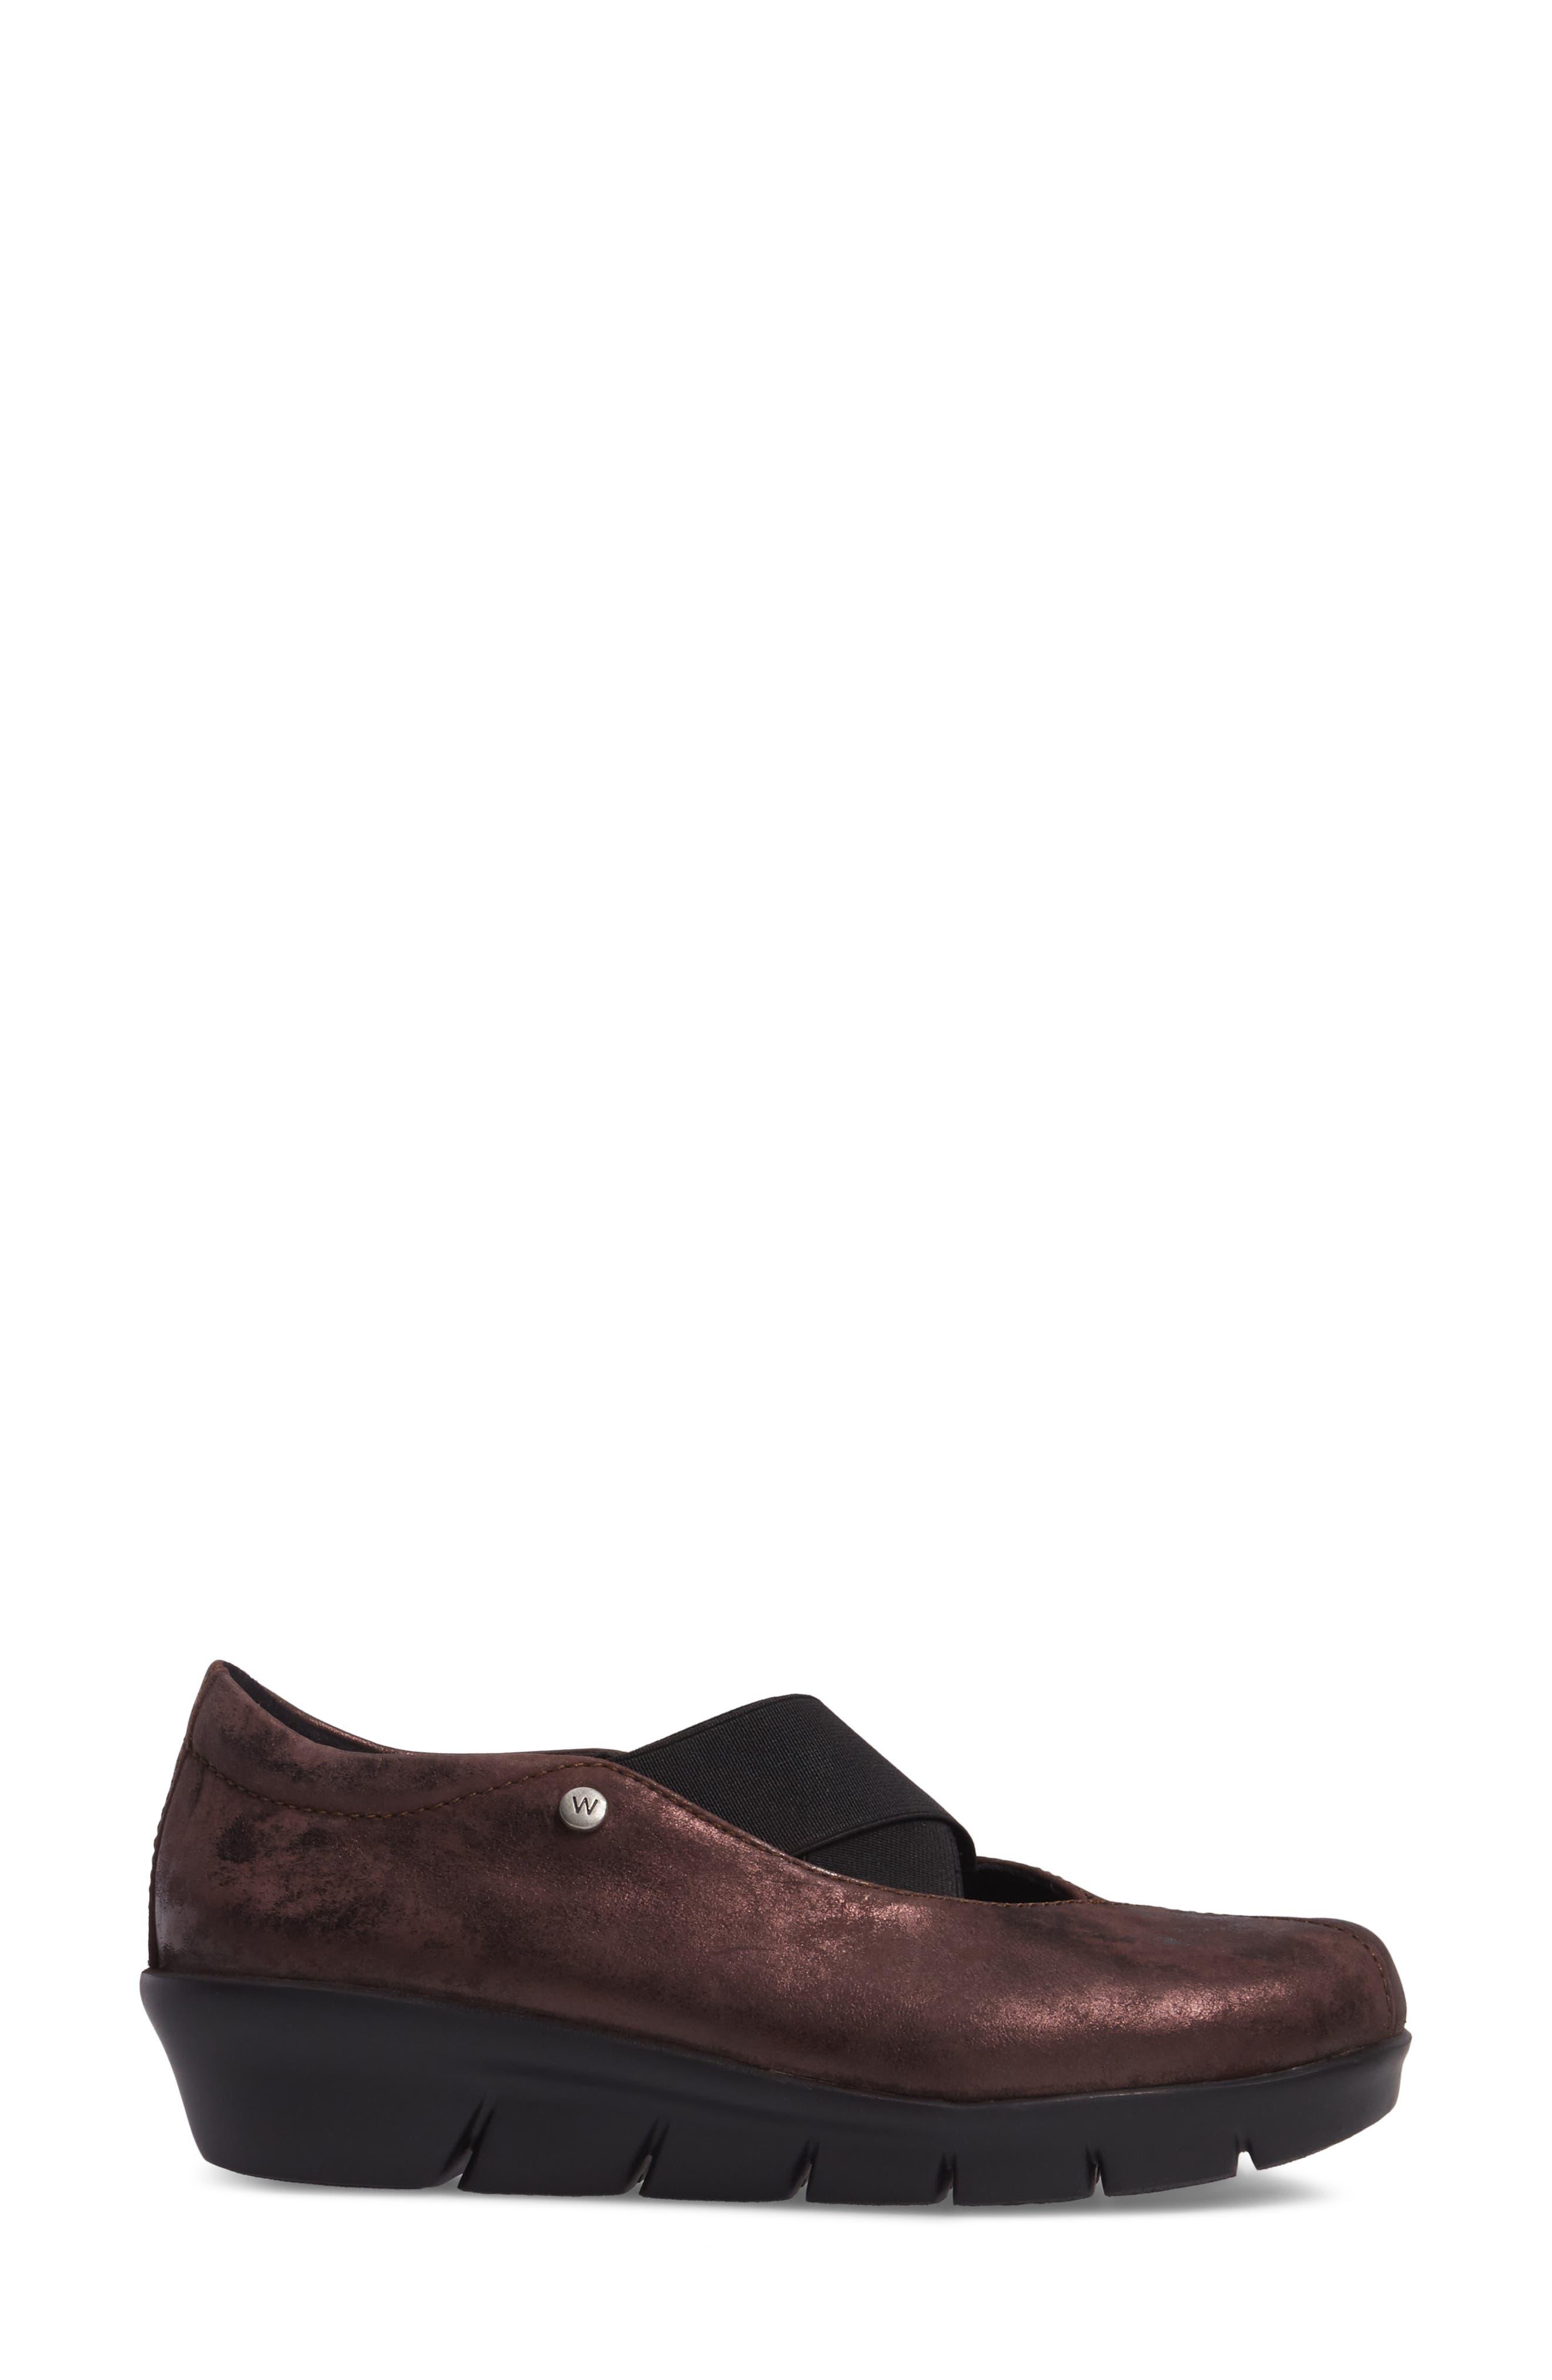 Cursa Slip-On Sneaker,                             Alternate thumbnail 3, color,                             Mocha Leather